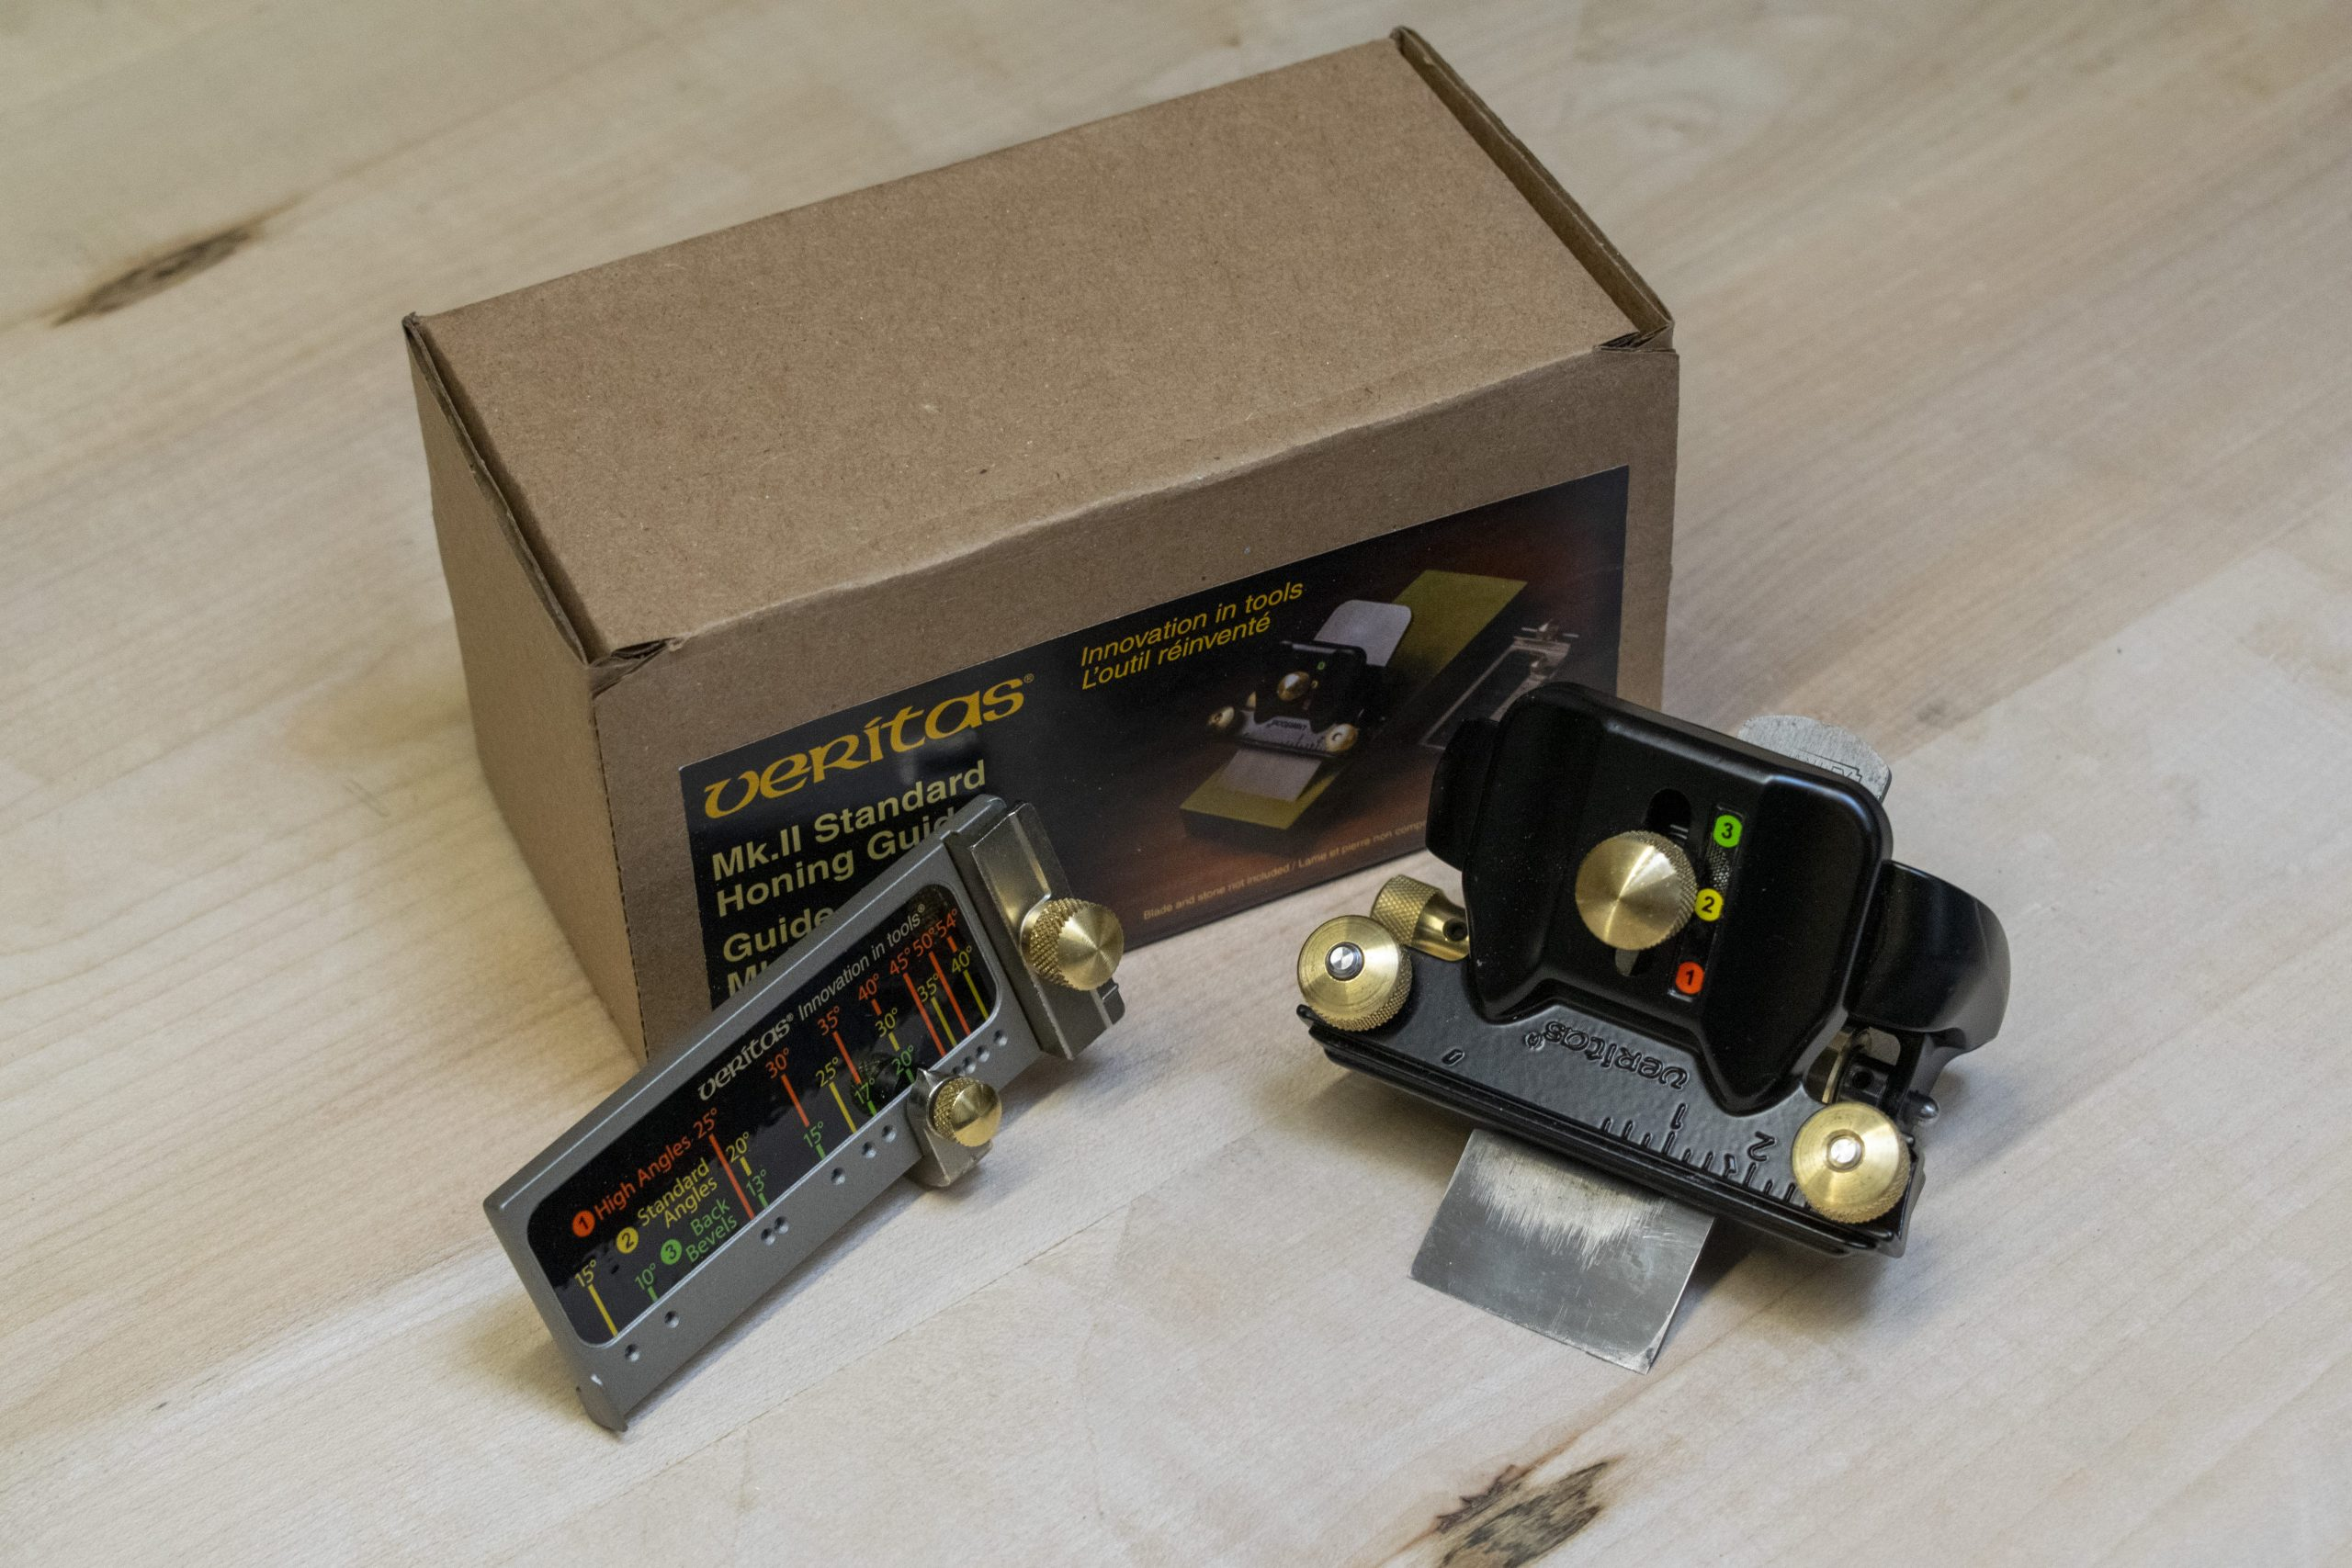 Veritas Mk II Honing Guide Box and Contents